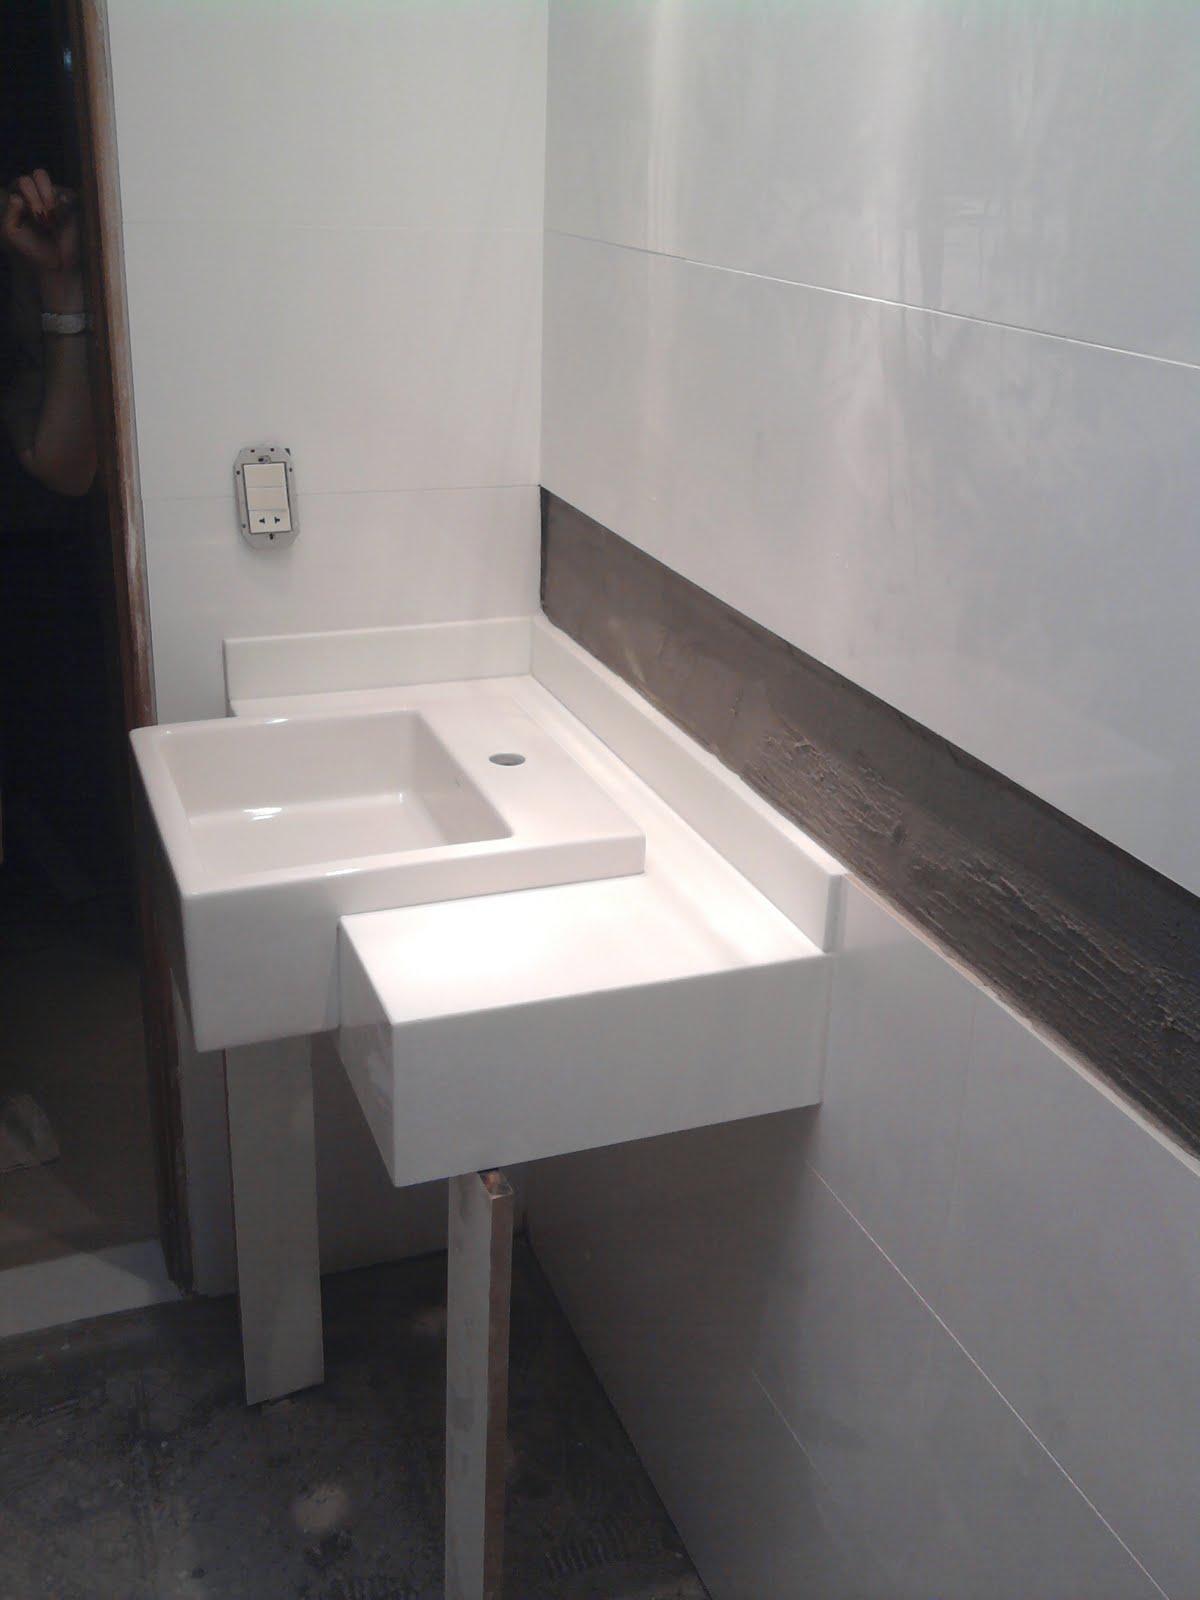 OLHA O MEU APÊ: Bancada no lugar êêê! #625753 1200x1600 Bancada Banheiro Marmoglass